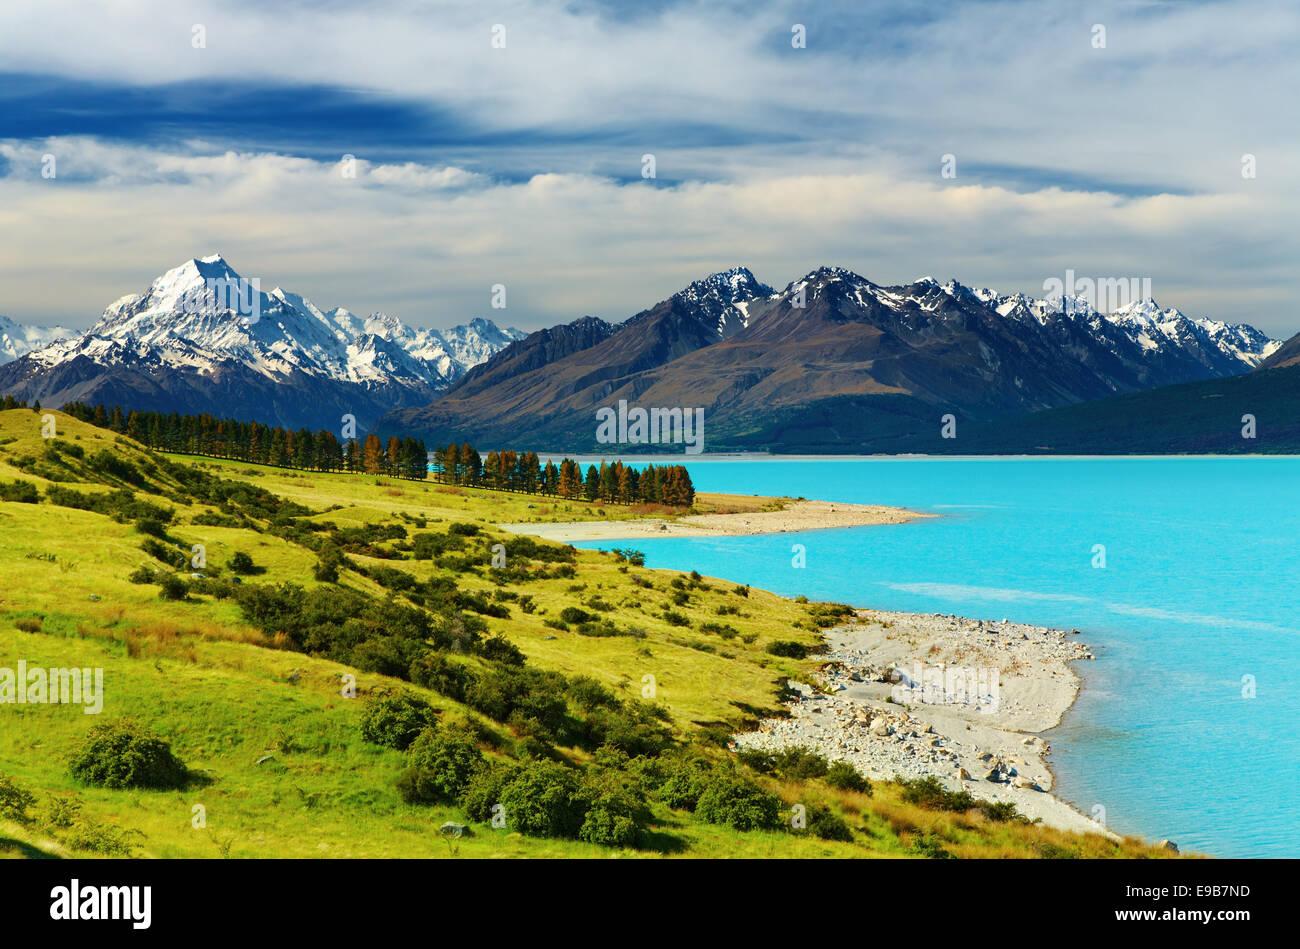 Mount Cook and Pukaki lake, New Zealand - Stock Image